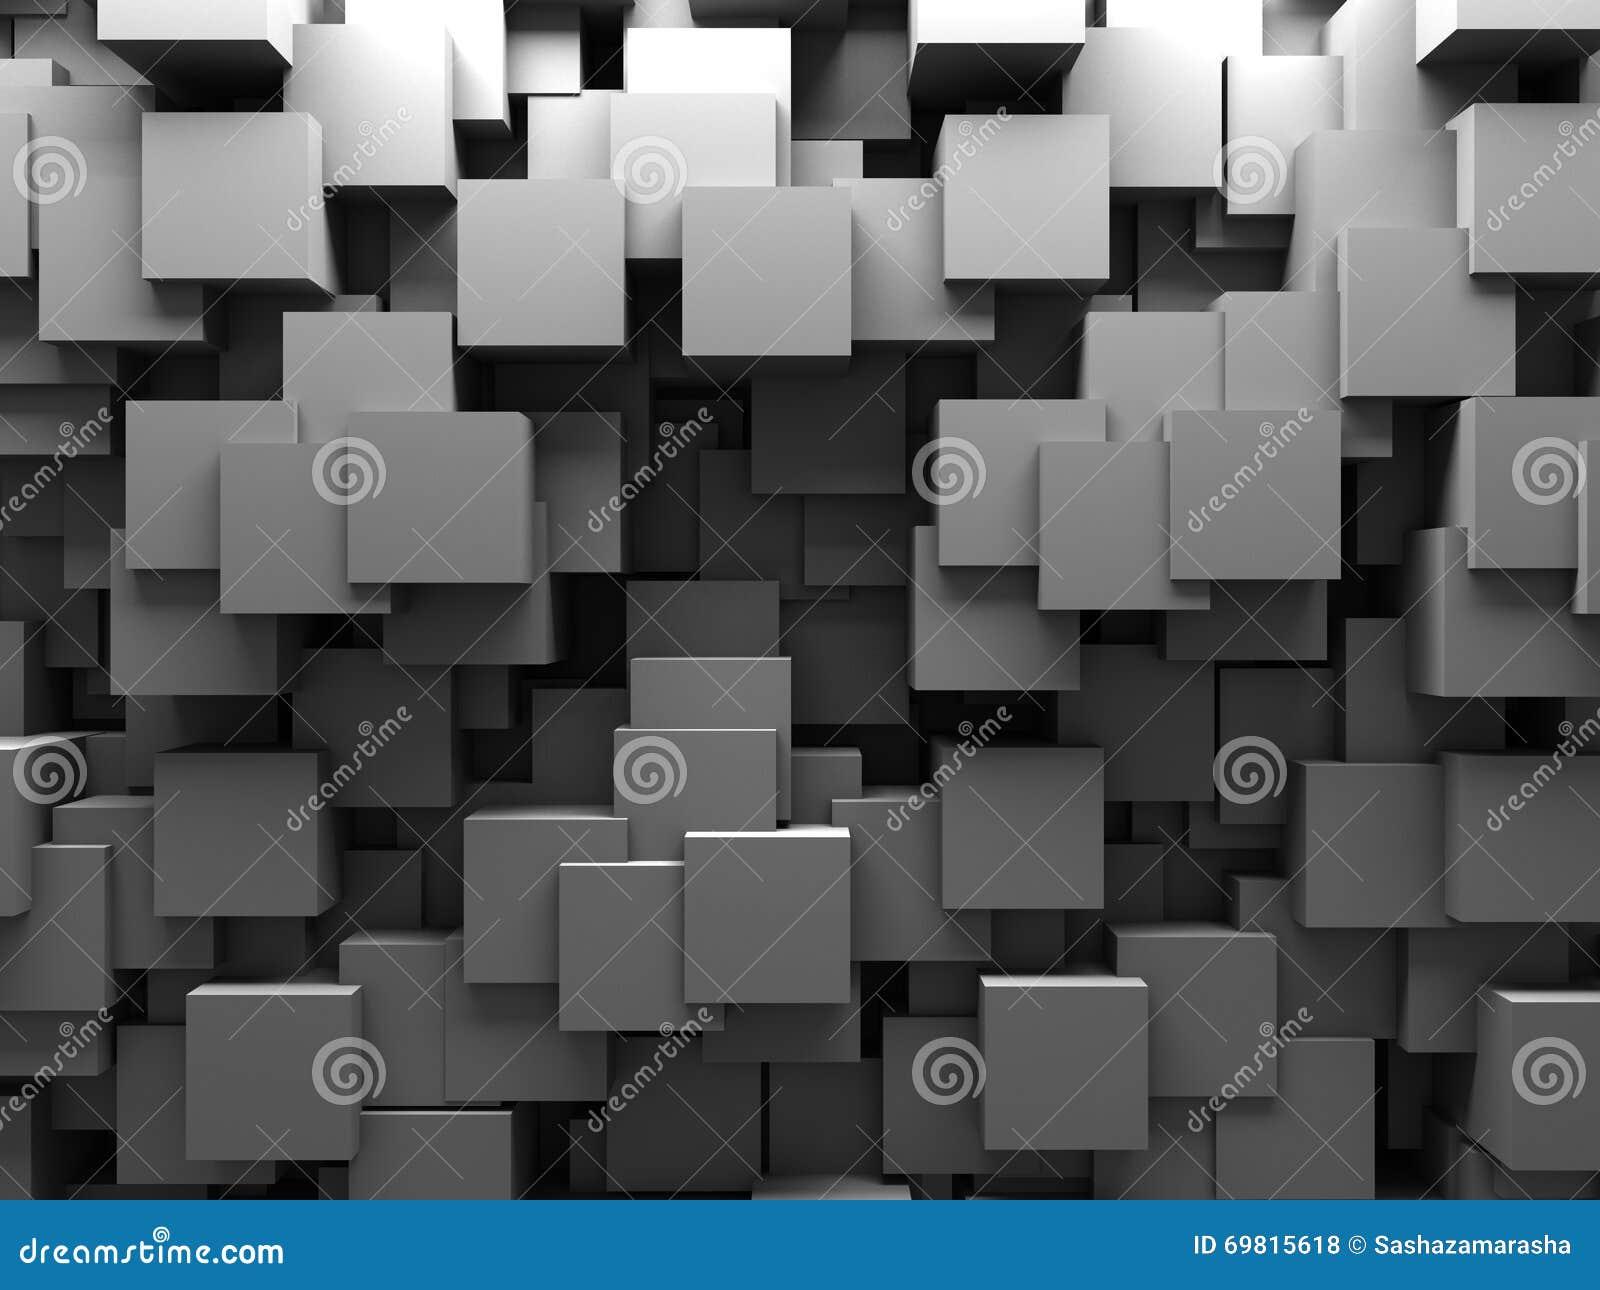 Abstract 3d Cubes Blocks Wallpaper Background Stock Illustration